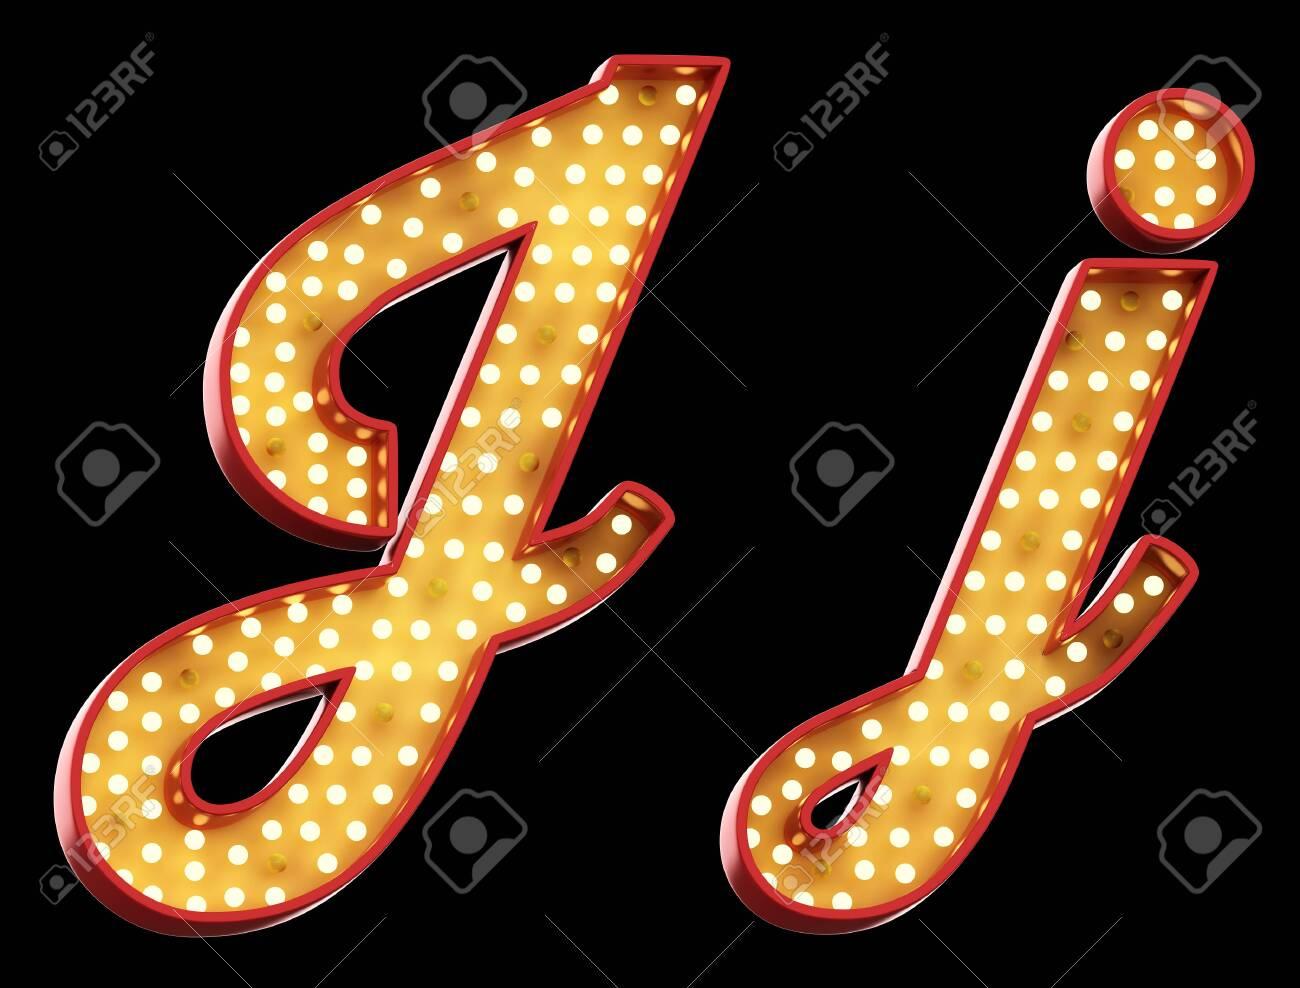 J j sign light font - 151932693